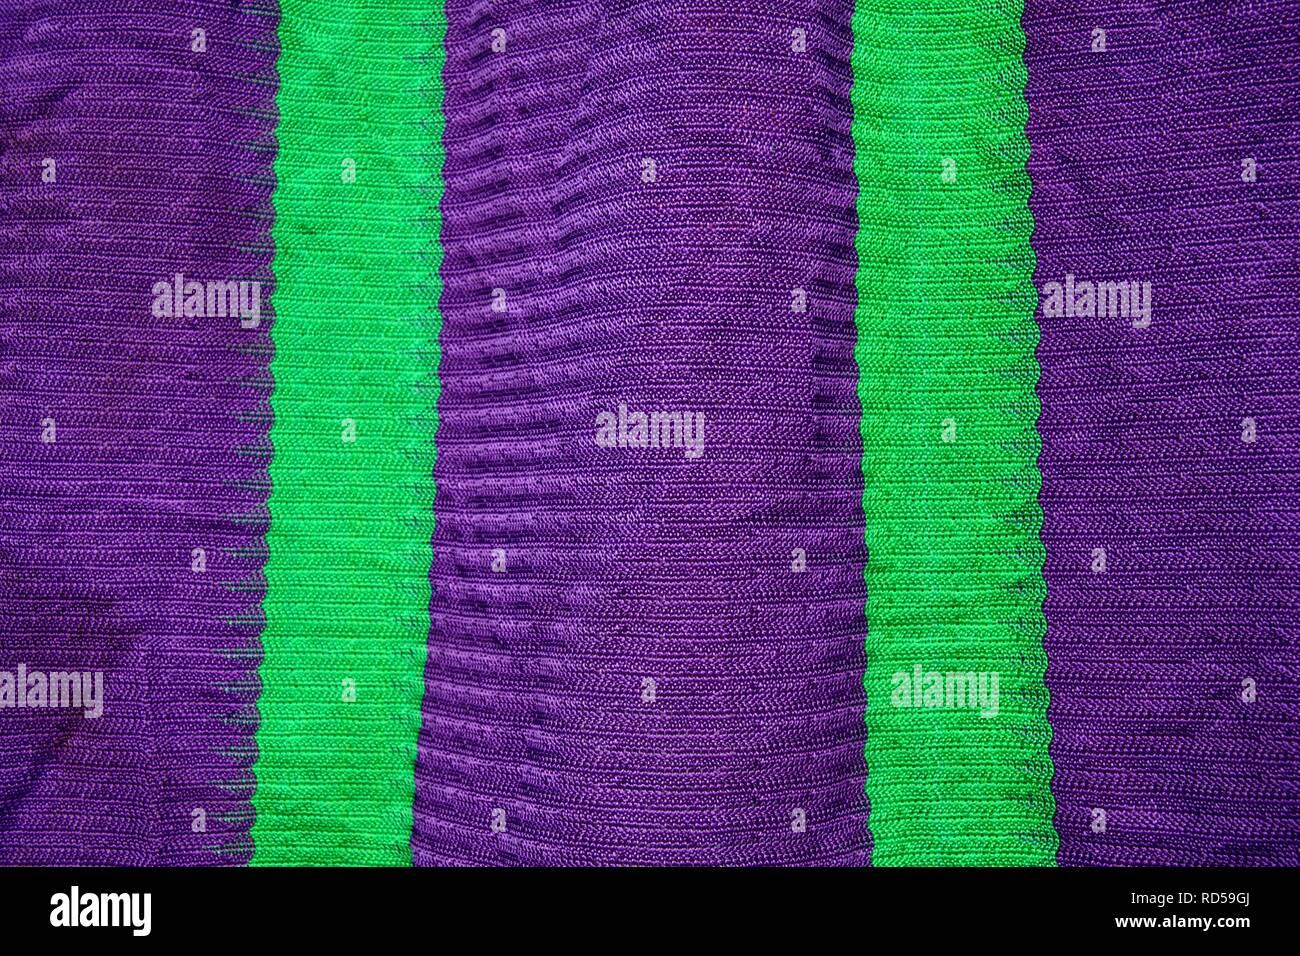 3340cc90d764 Vibrant Fabric Stock Photos & Vibrant Fabric Stock Images - Alamy